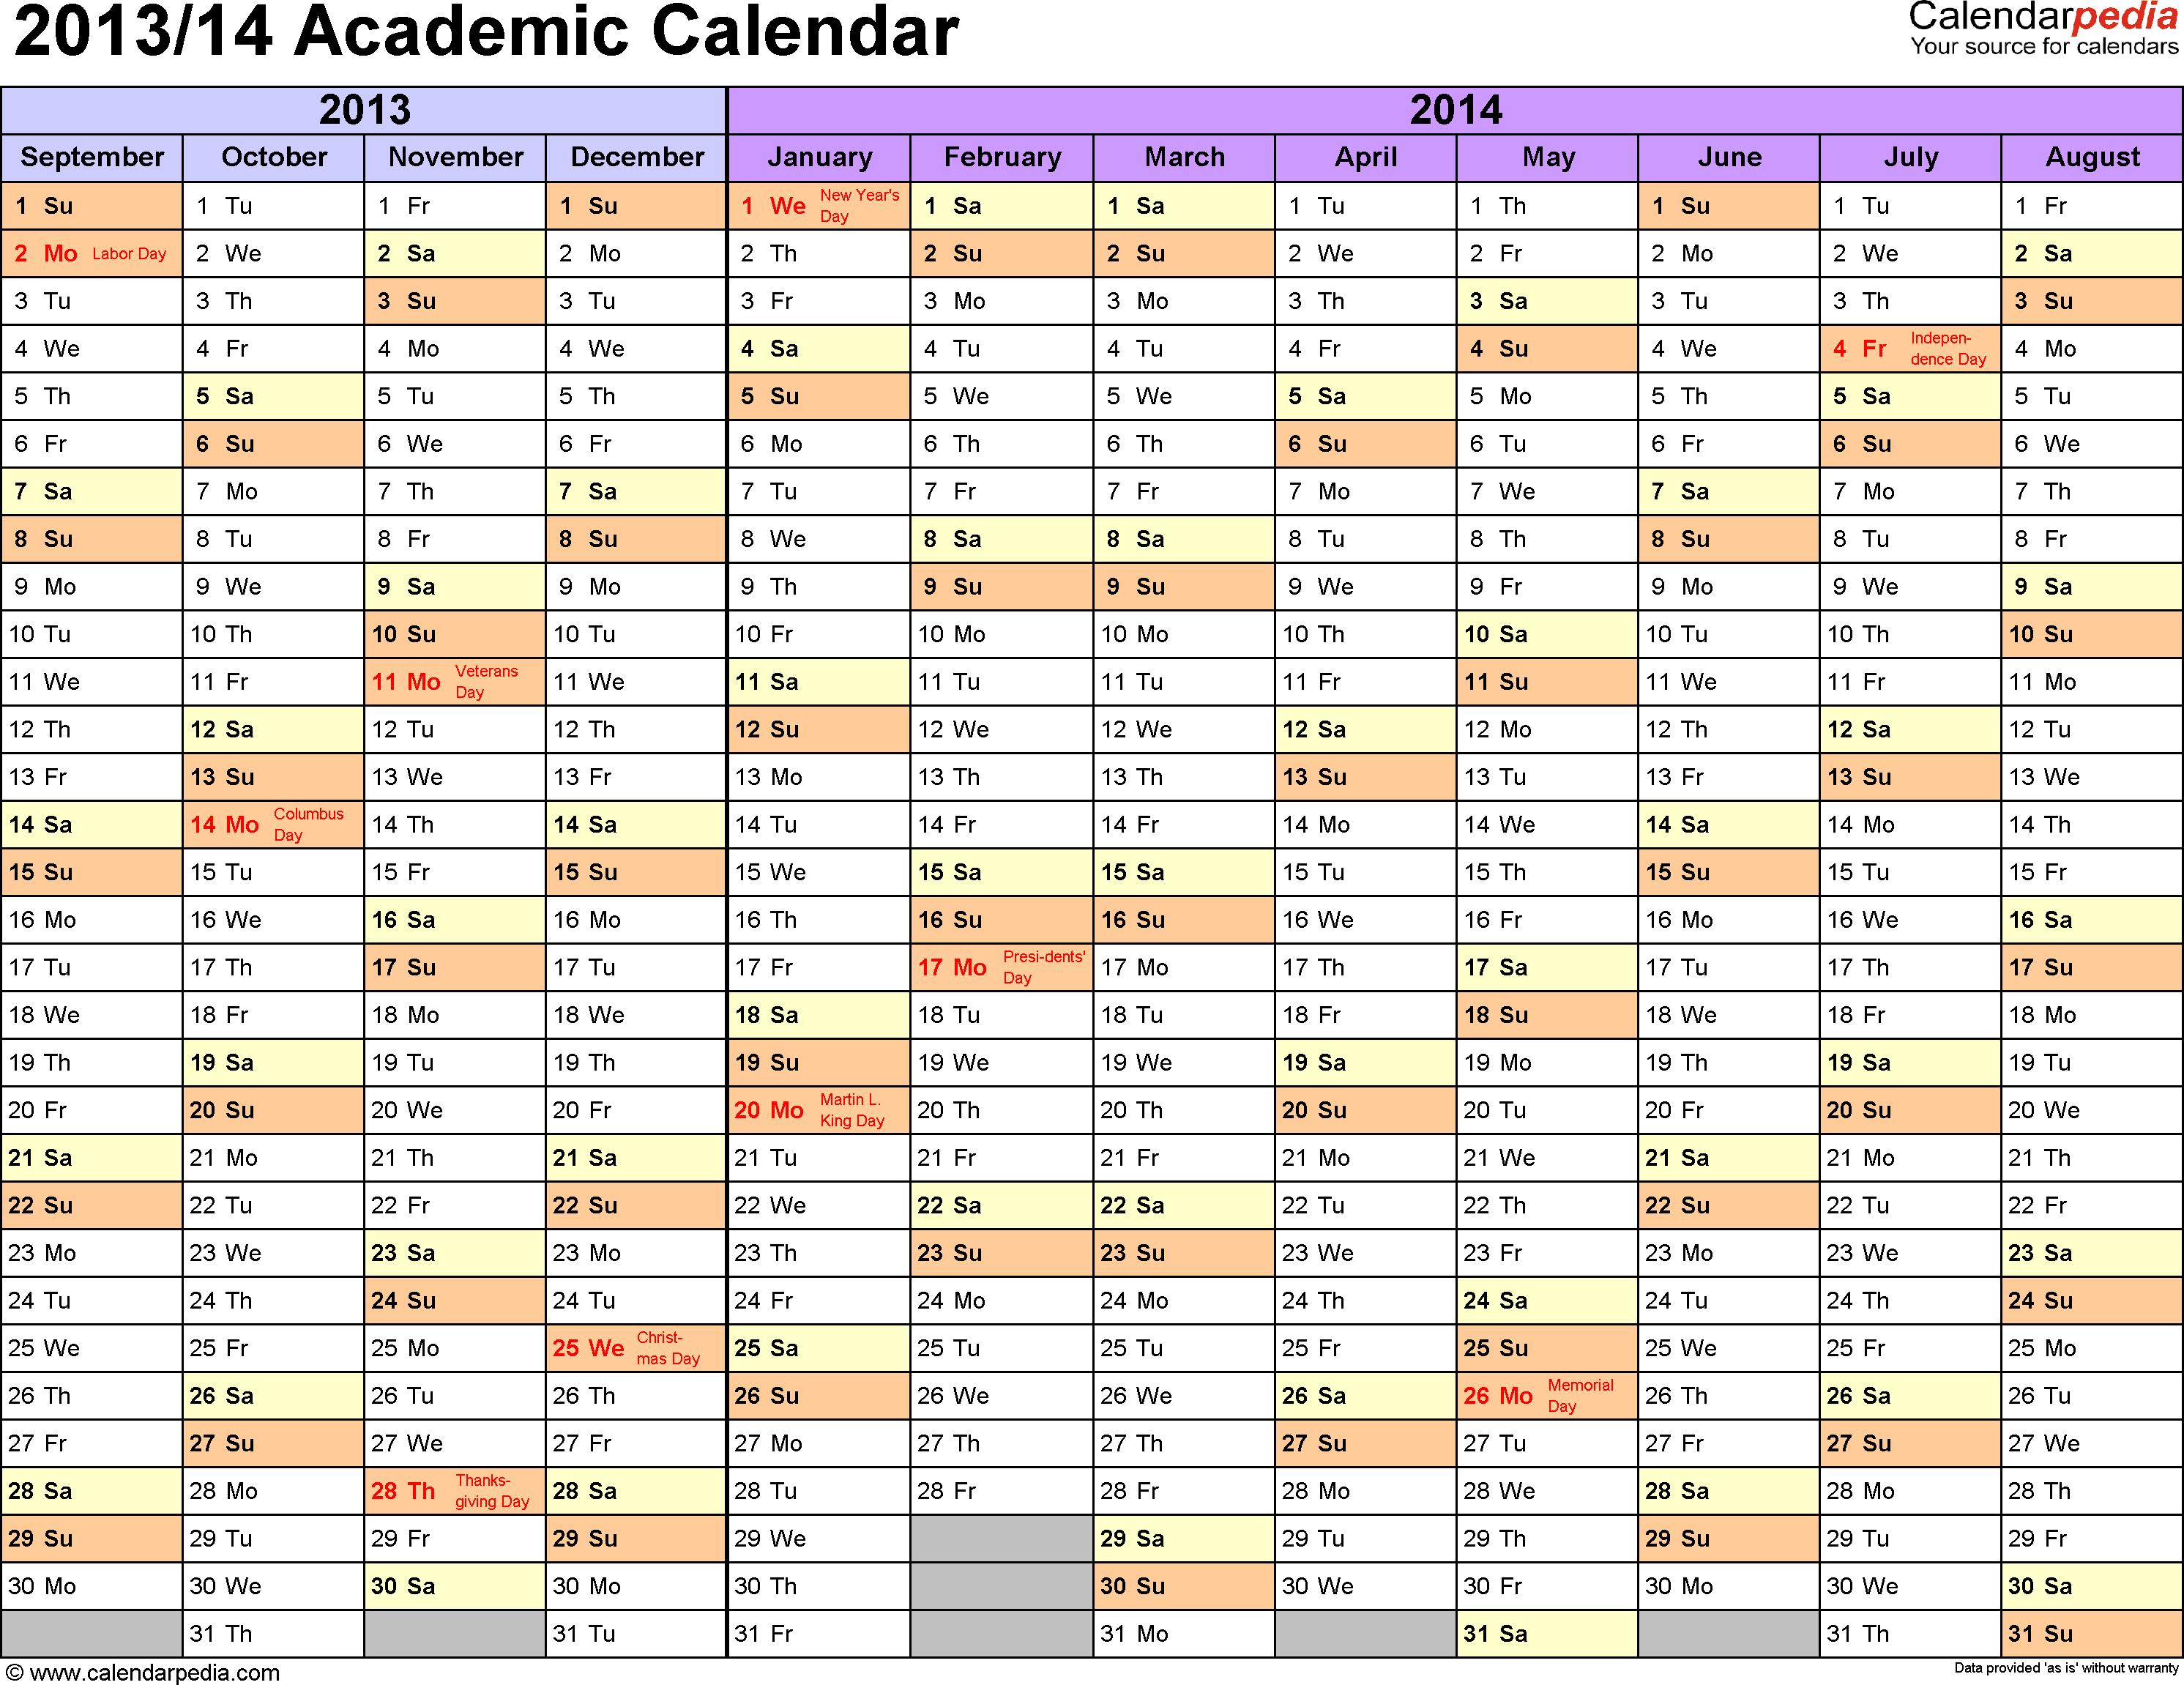 Download Template 1: Academic calendar 2013/14 for Microsoft Excel (.xlsx file), landscape, 1 page